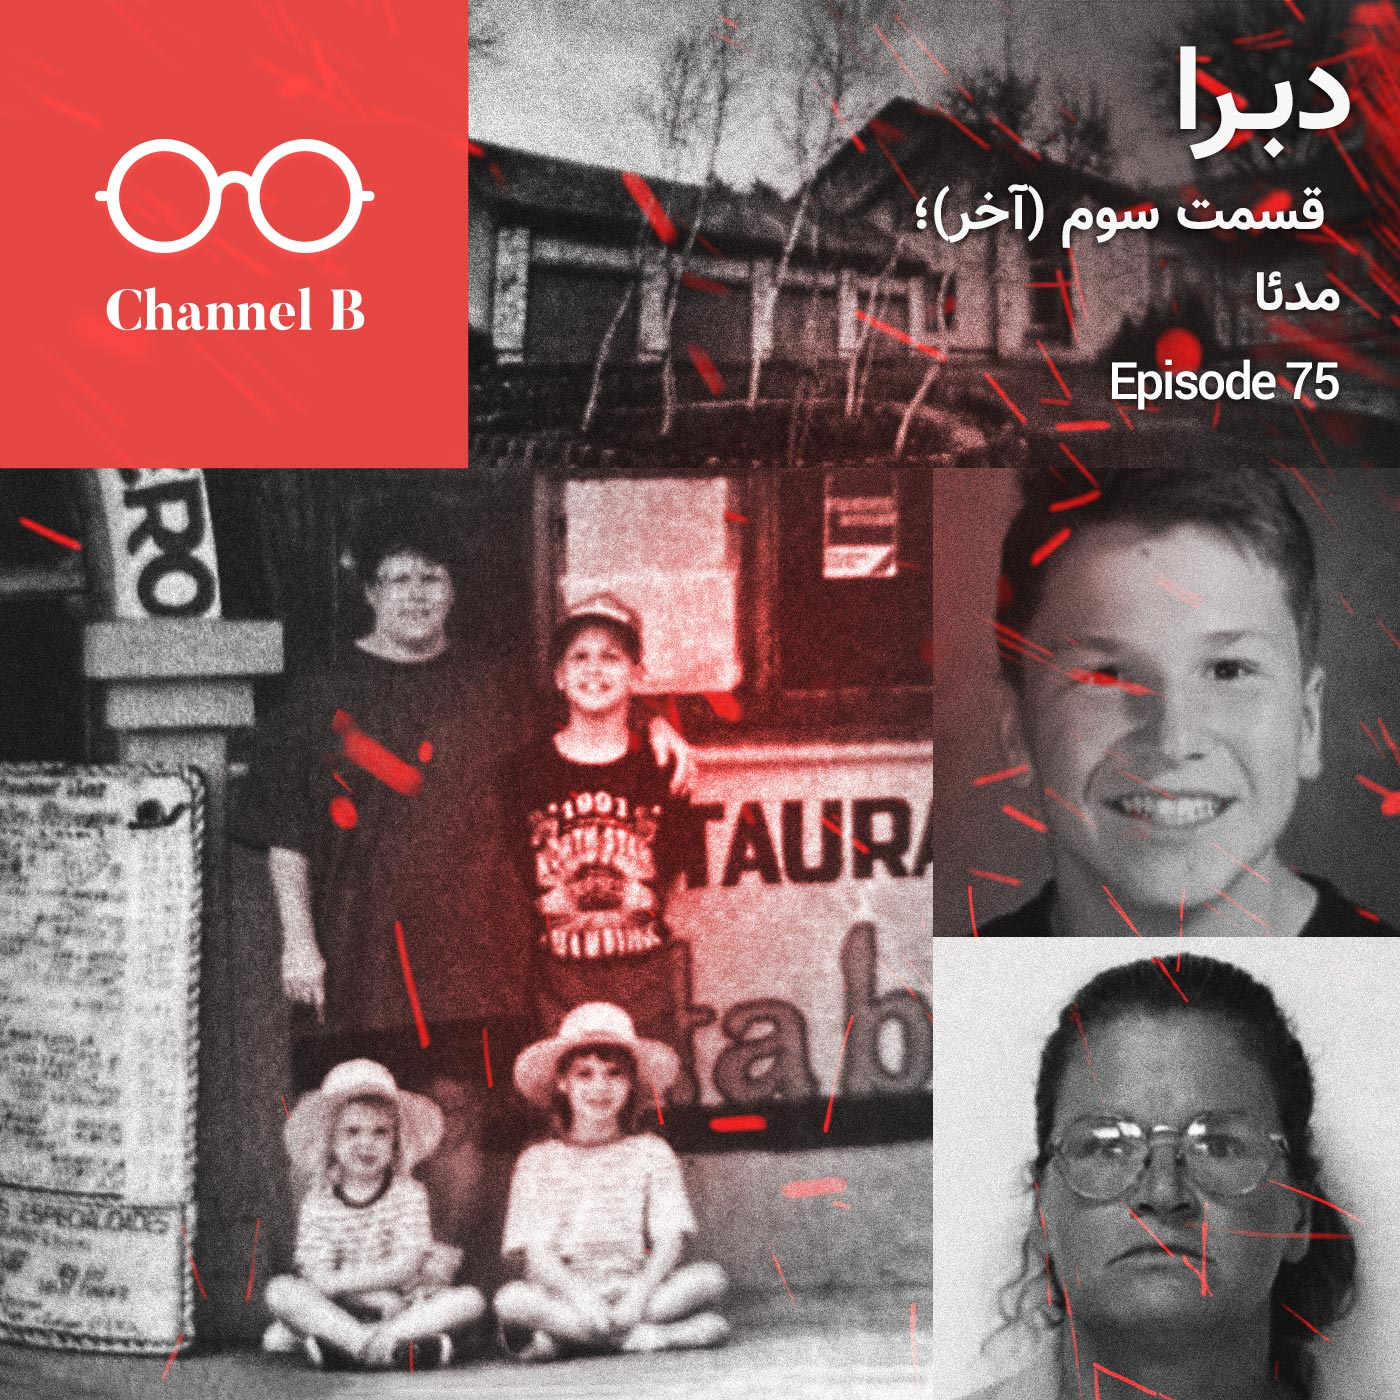 هفتاد و پنج – سریال دبرا قسمت سوم(آخر)؛ مدئا